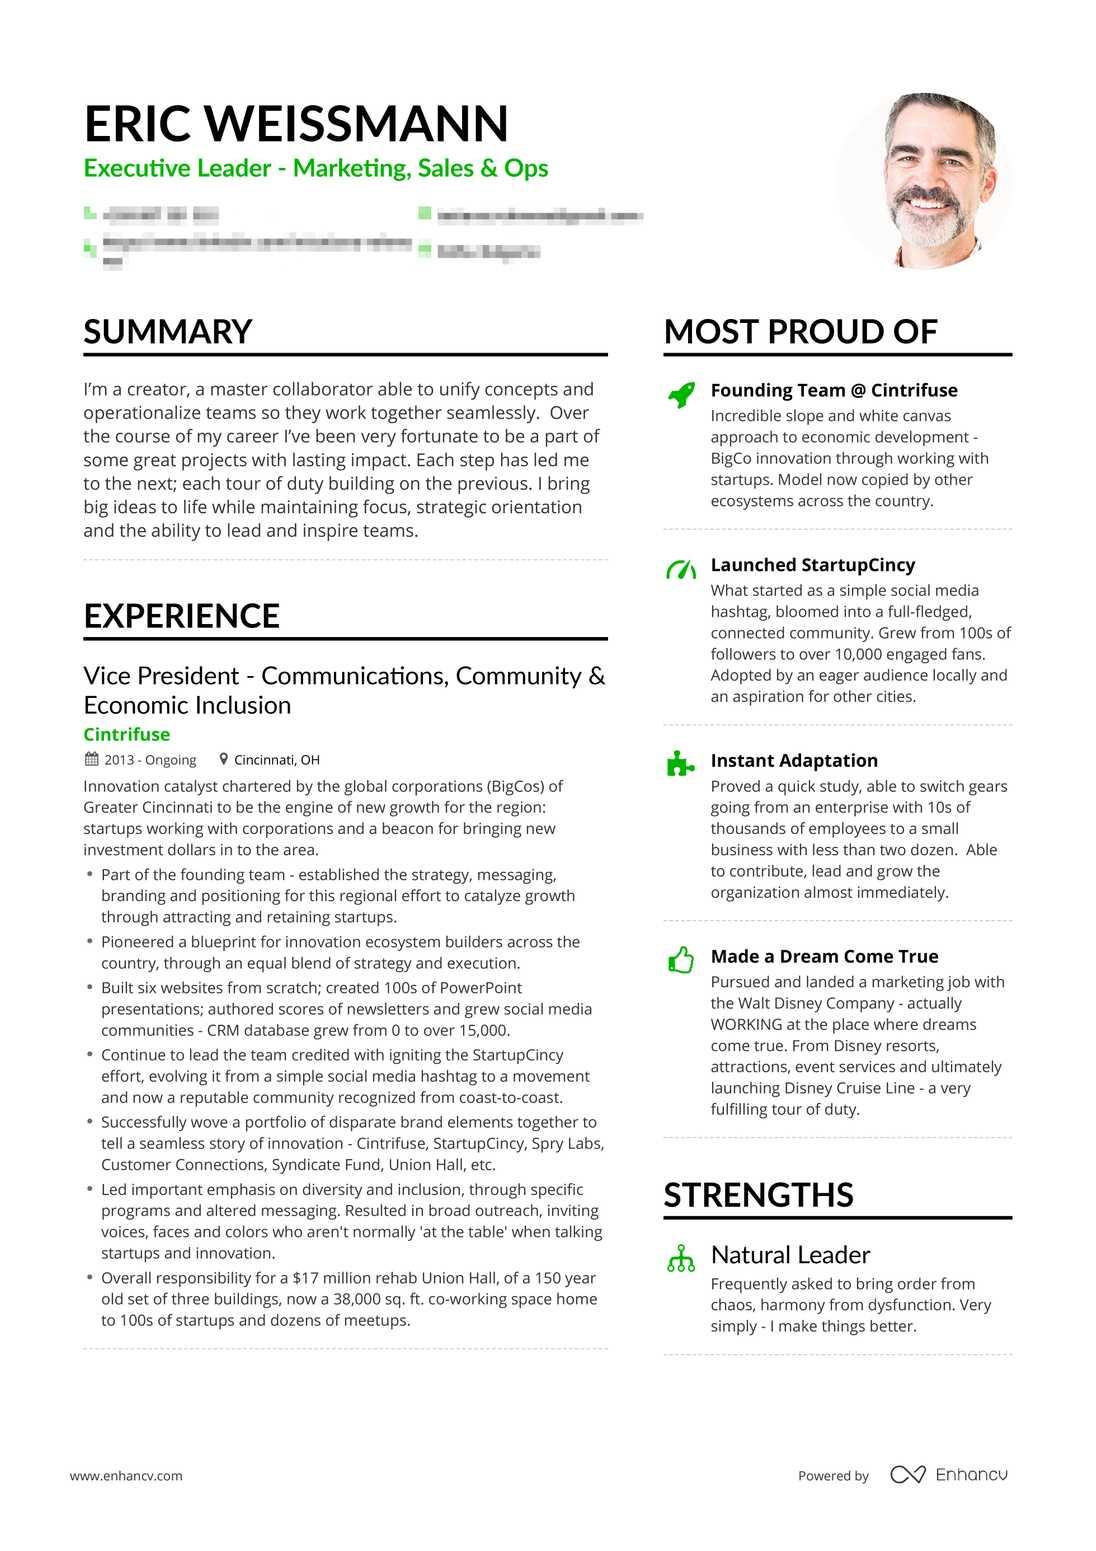 Real Marketing Executive Resume Example Enhancv